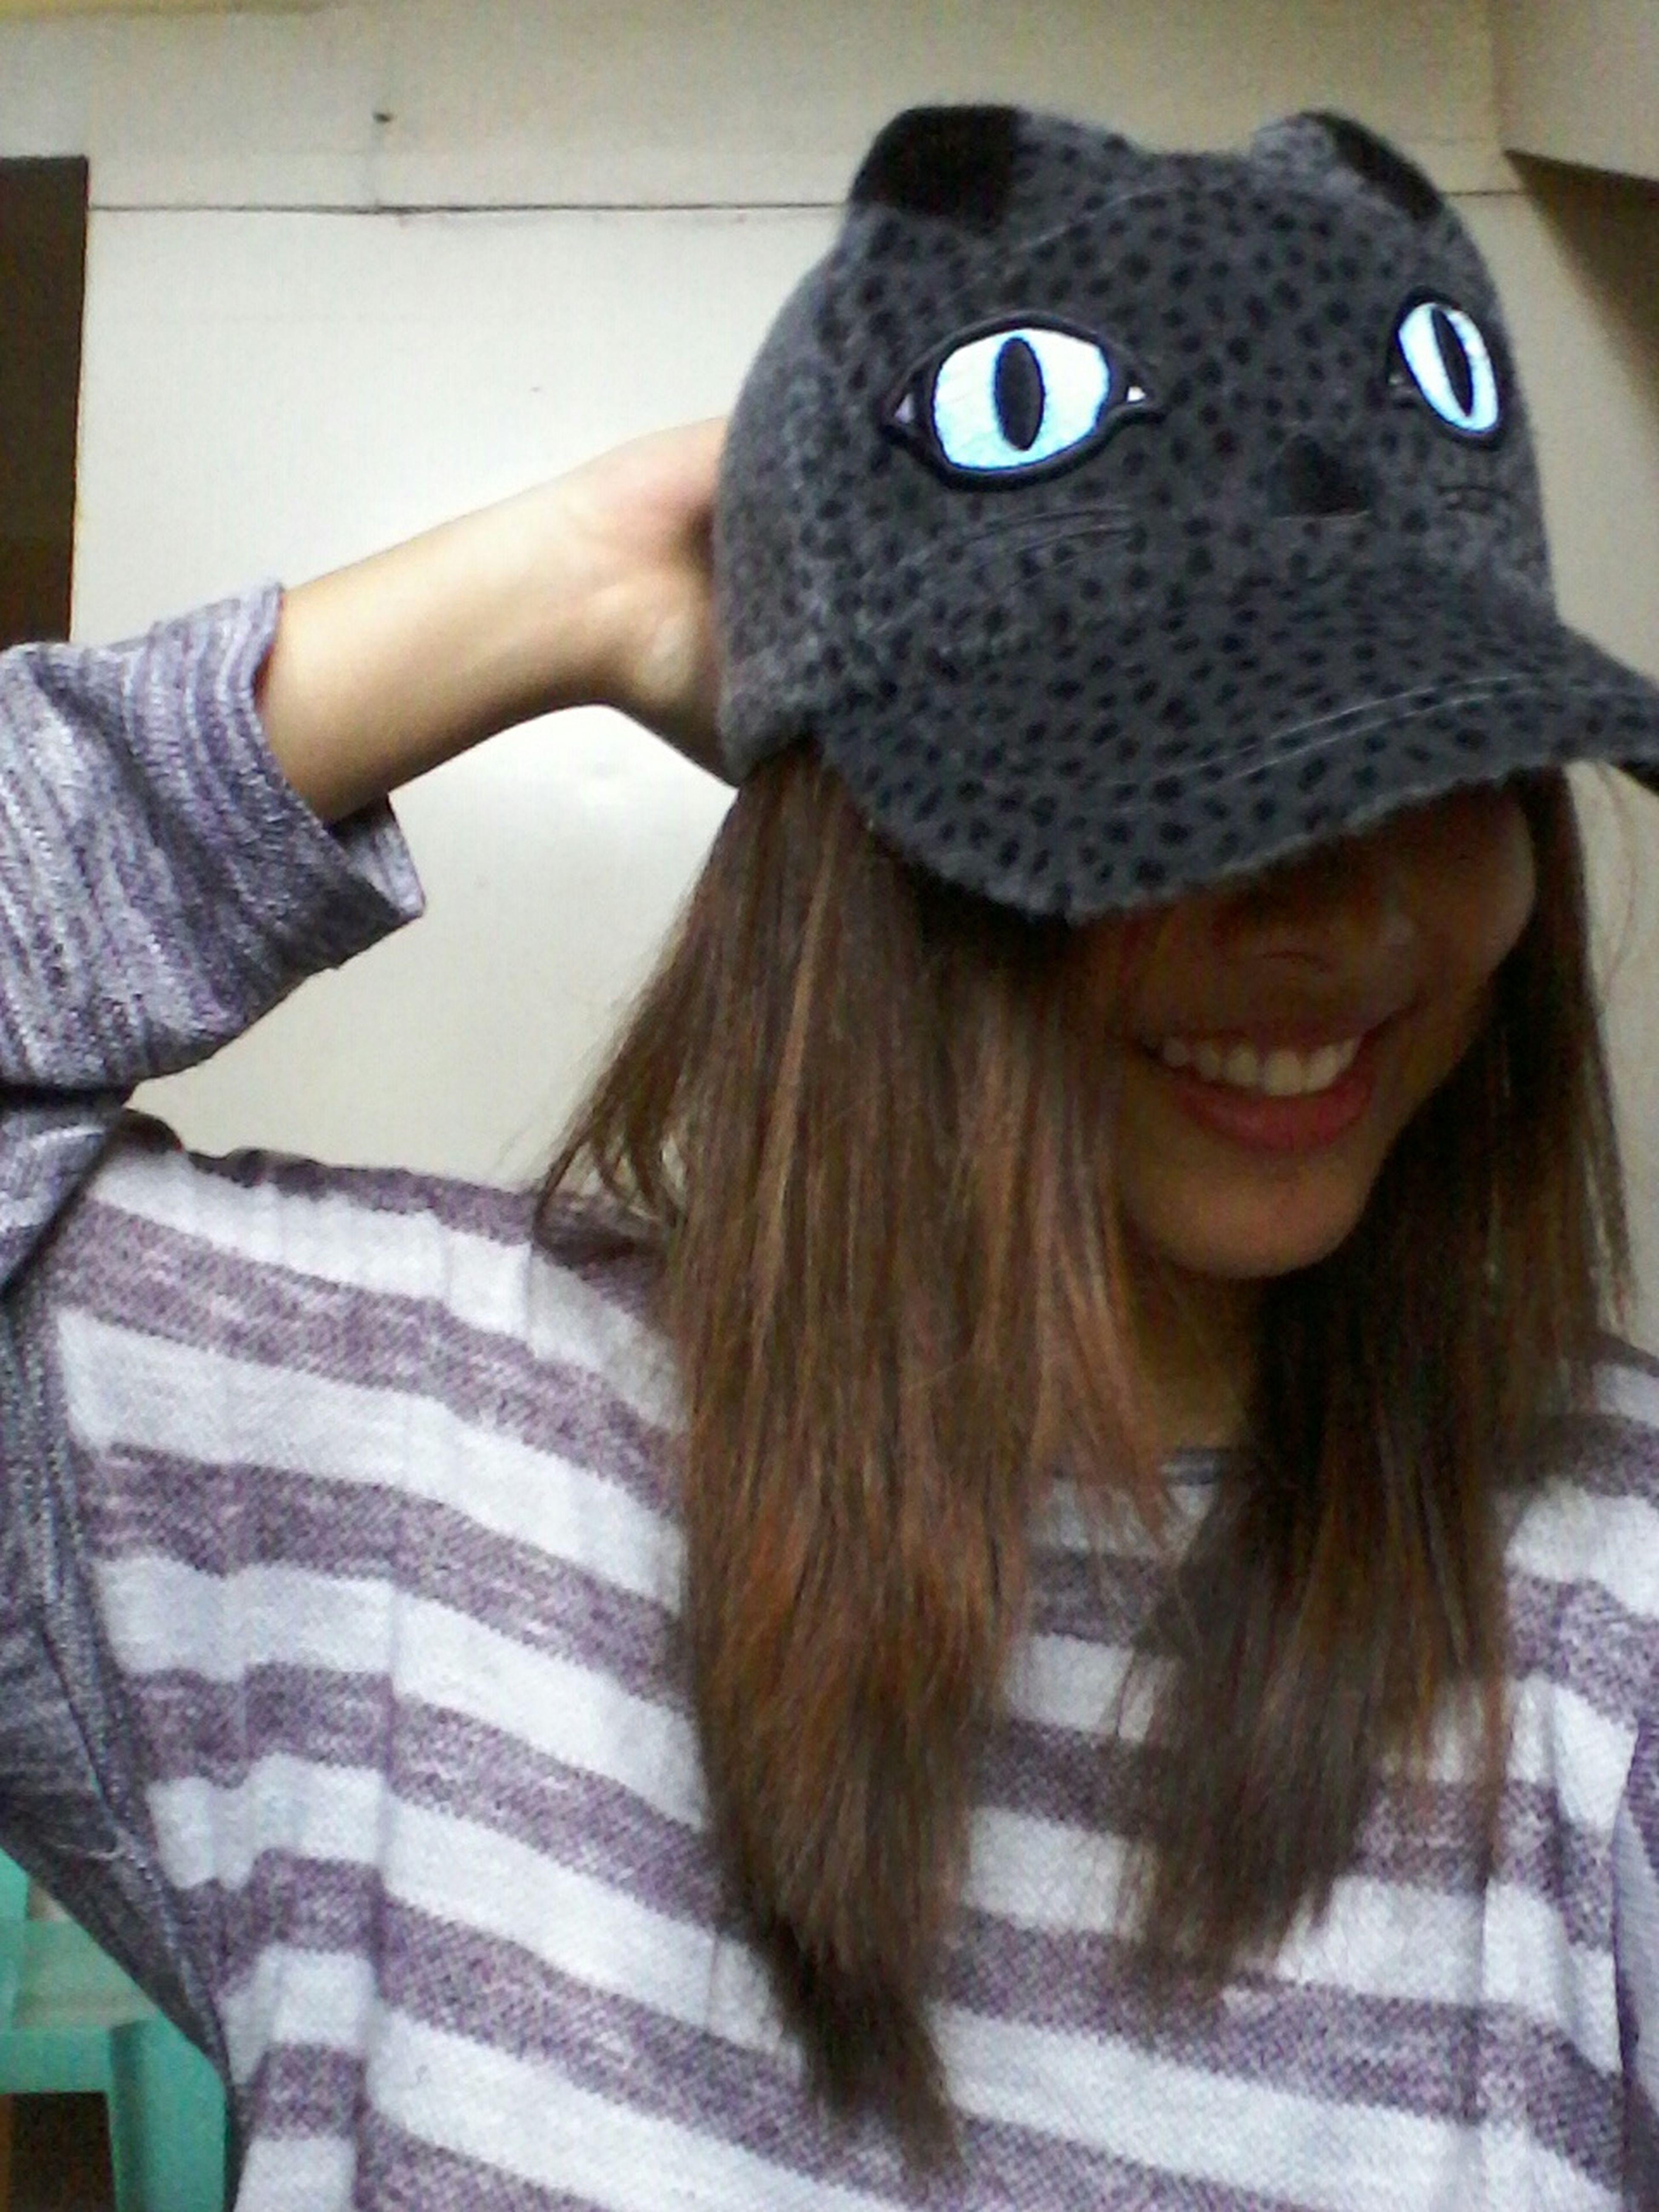 Lovingnthis cap ♡ ☆ ☆ ☆ Selfieonrainydays Sweaterishart First Eyeem Photo